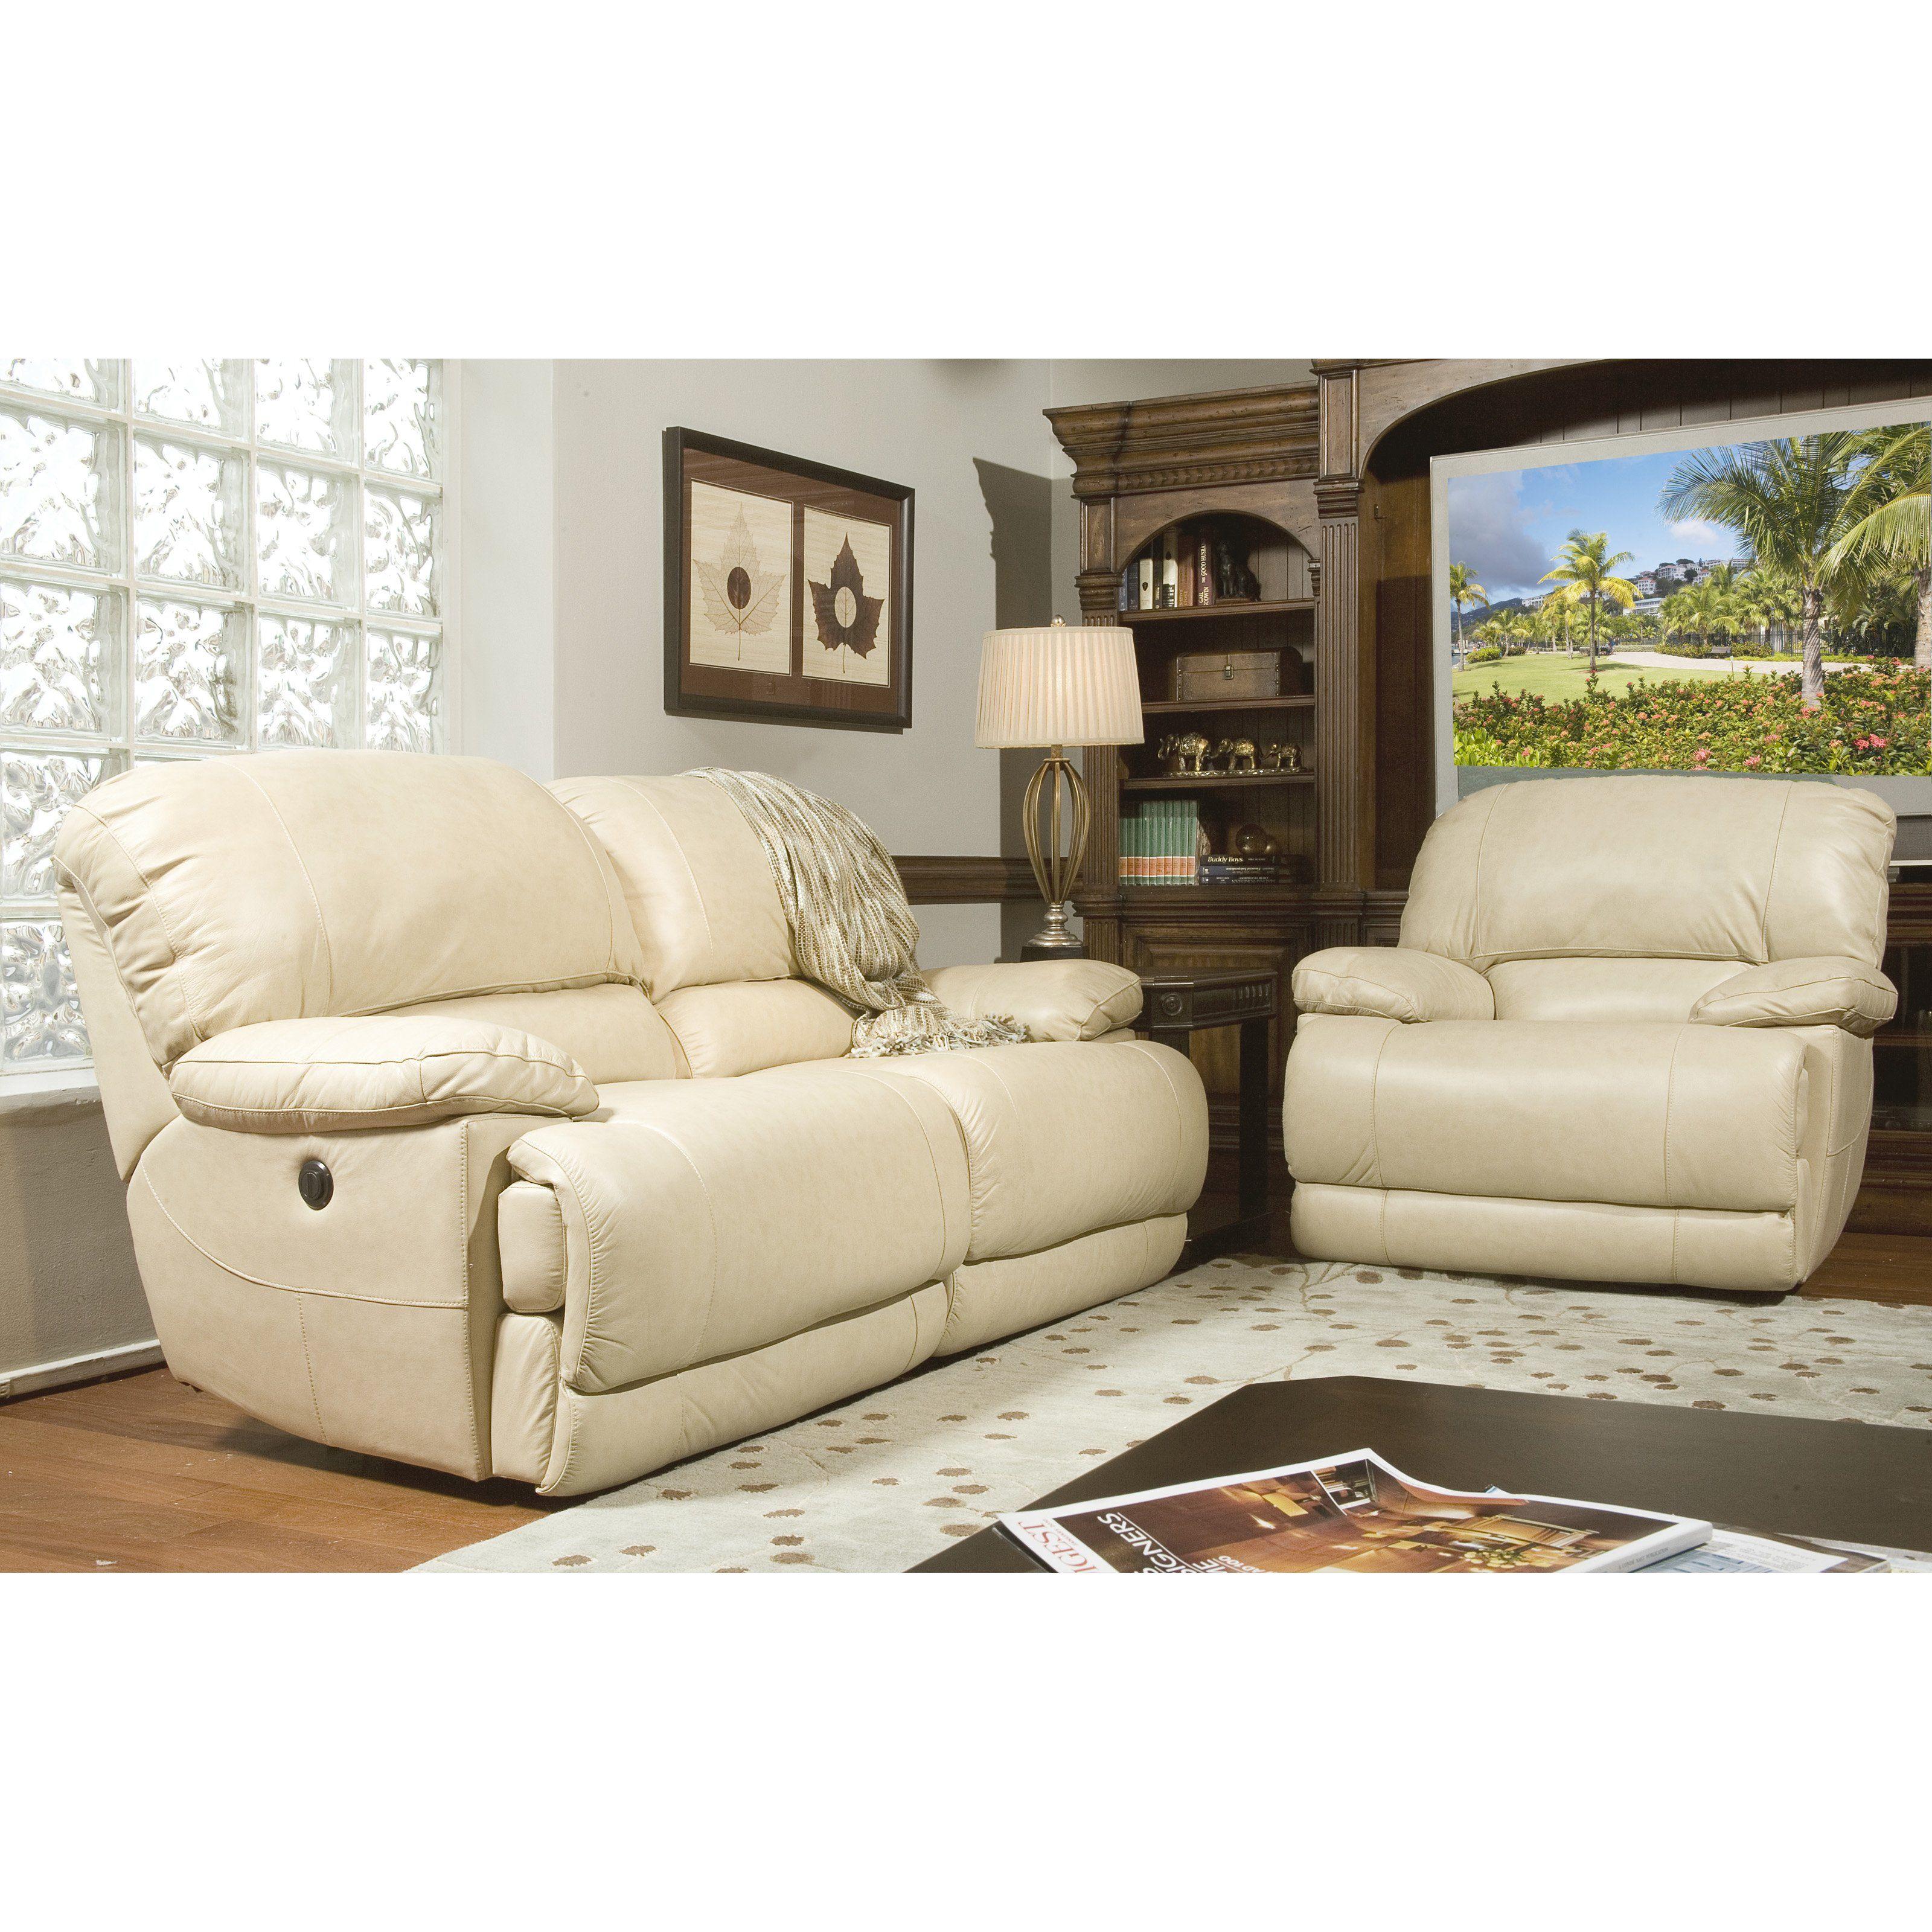 Parker House Mars Leather Sofa Set Wheat Www Hayneedle Com Leather Sofa Set Parker House Sofa Set